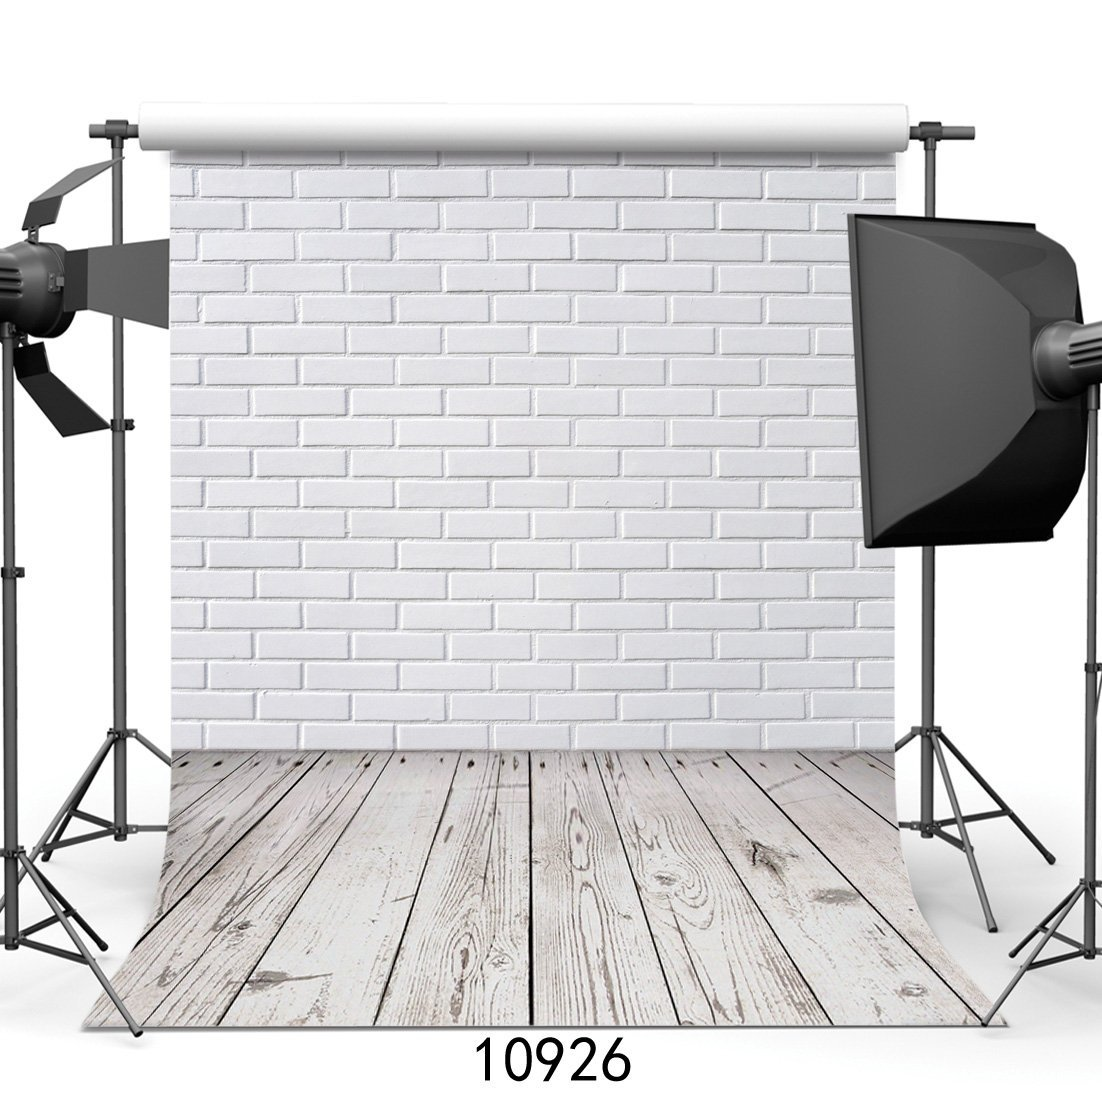 WOLADA 5X7ft Photography Background White Brick Wall Wood Floor theme Backdrops Photo Studio Backdrop Props 10926